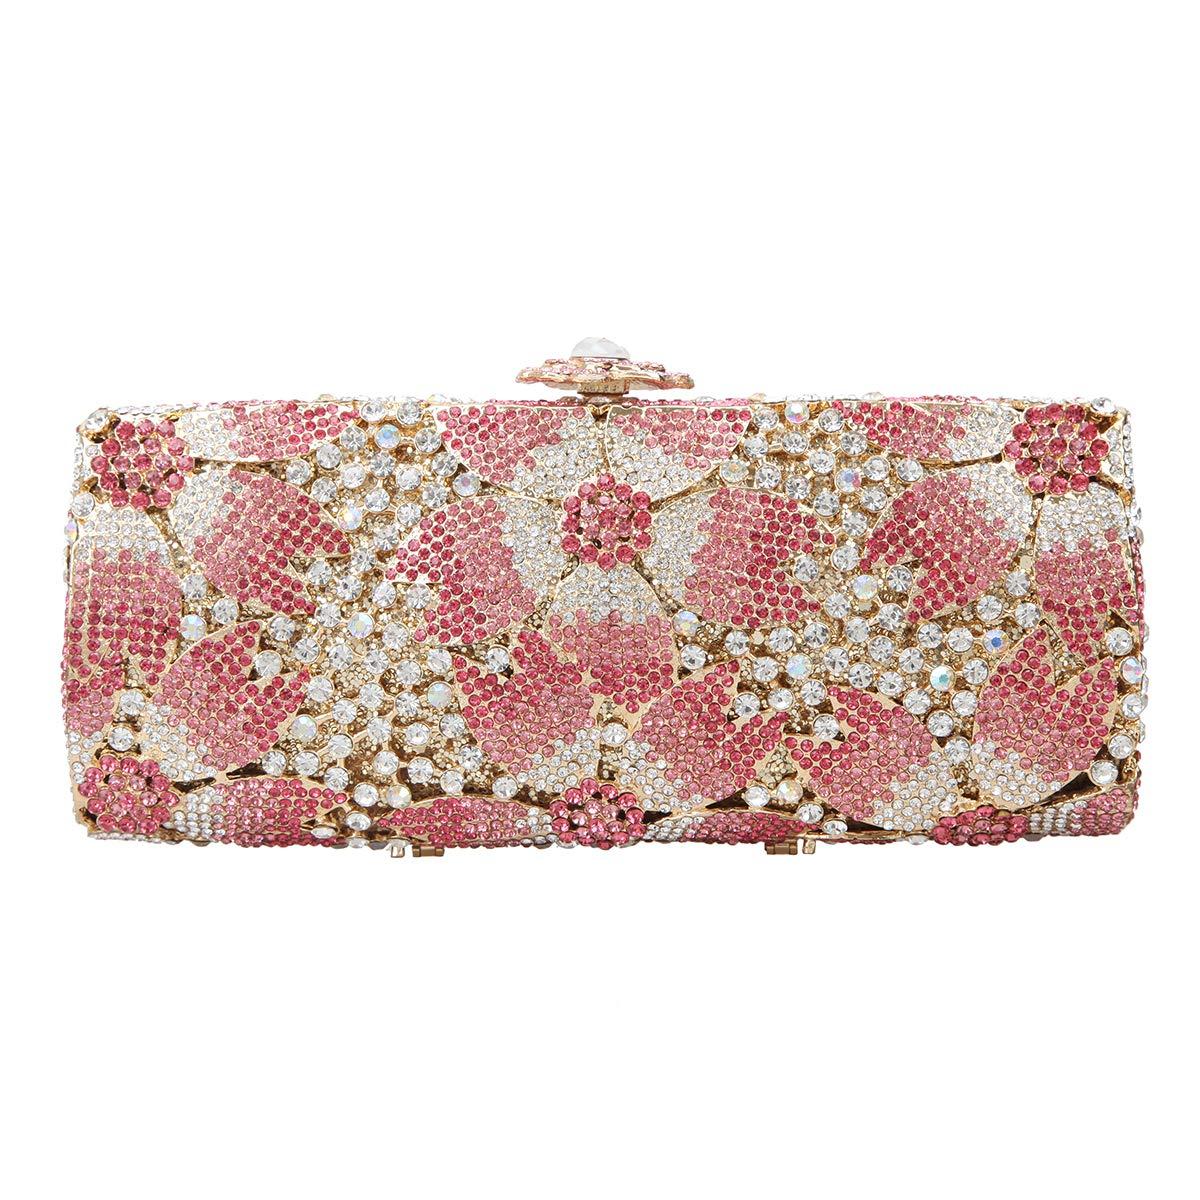 Fawziya Sakura Flower Hard Case Purse Luxury Crystal Evening Clutch Handbag-Pink